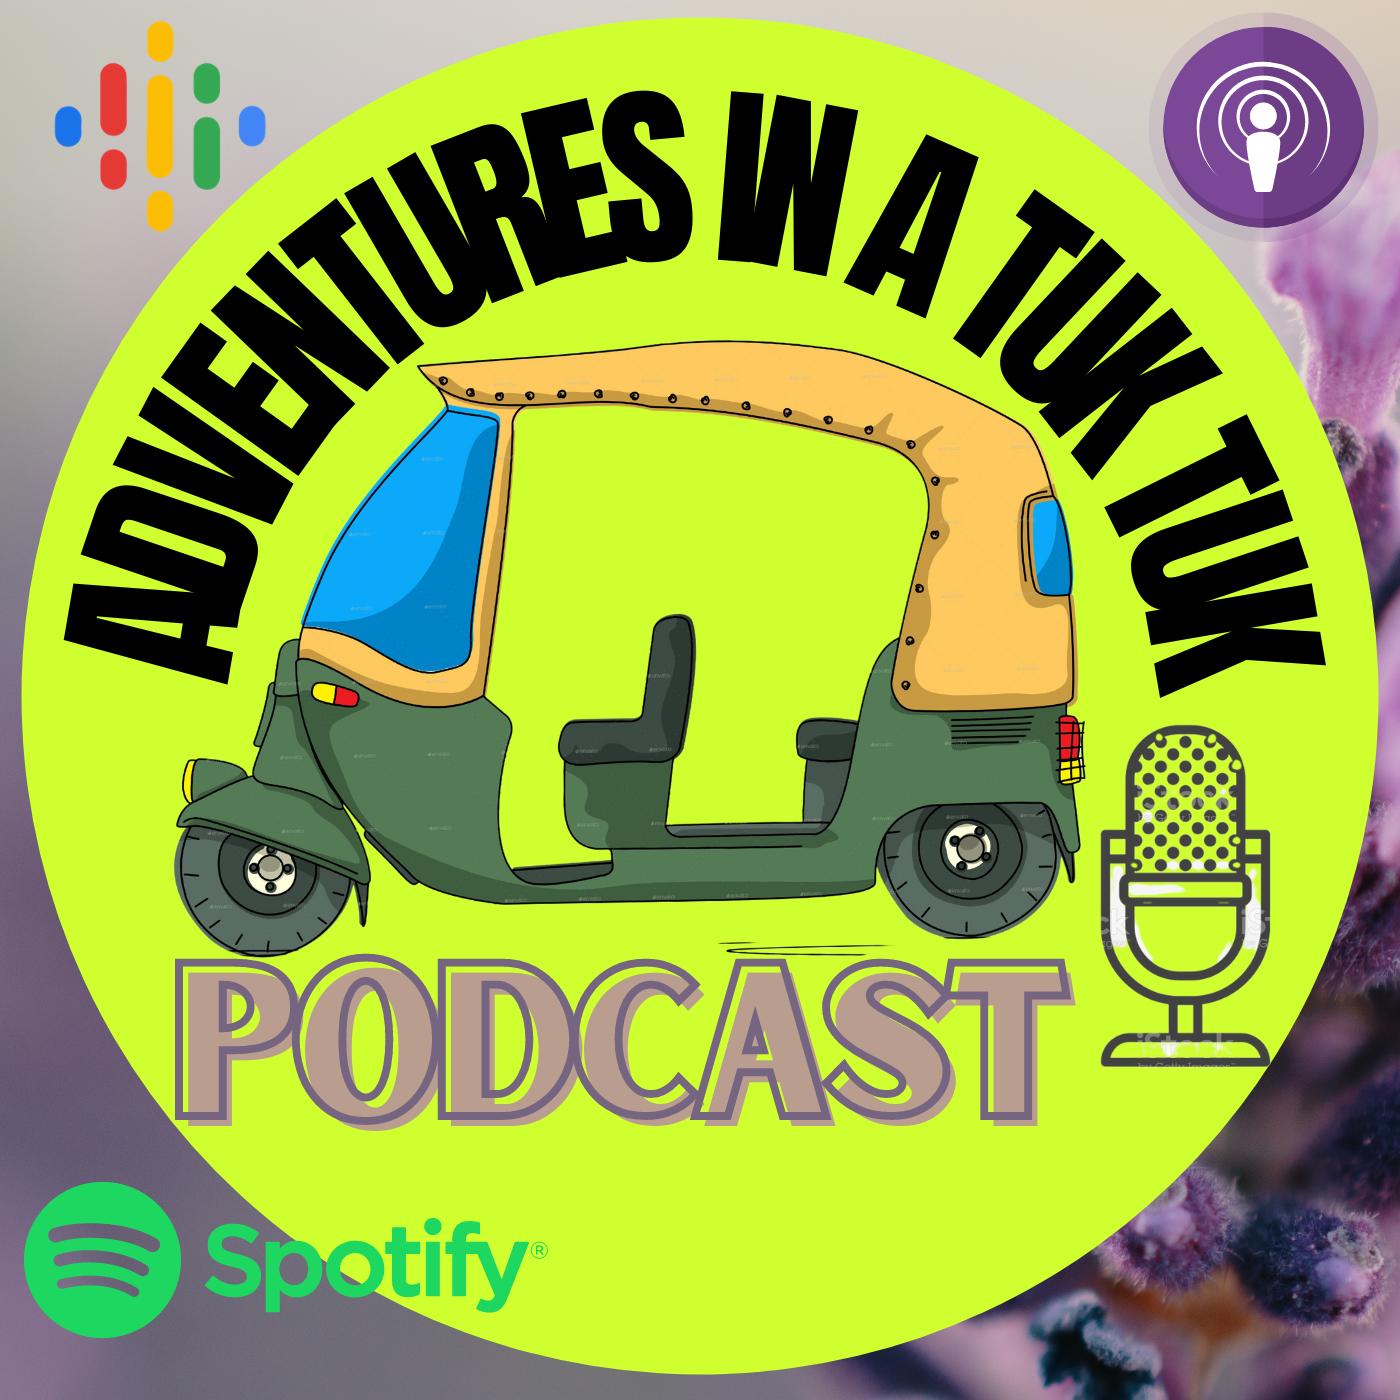 Artwork for podcast Adventures in a tuk tuk